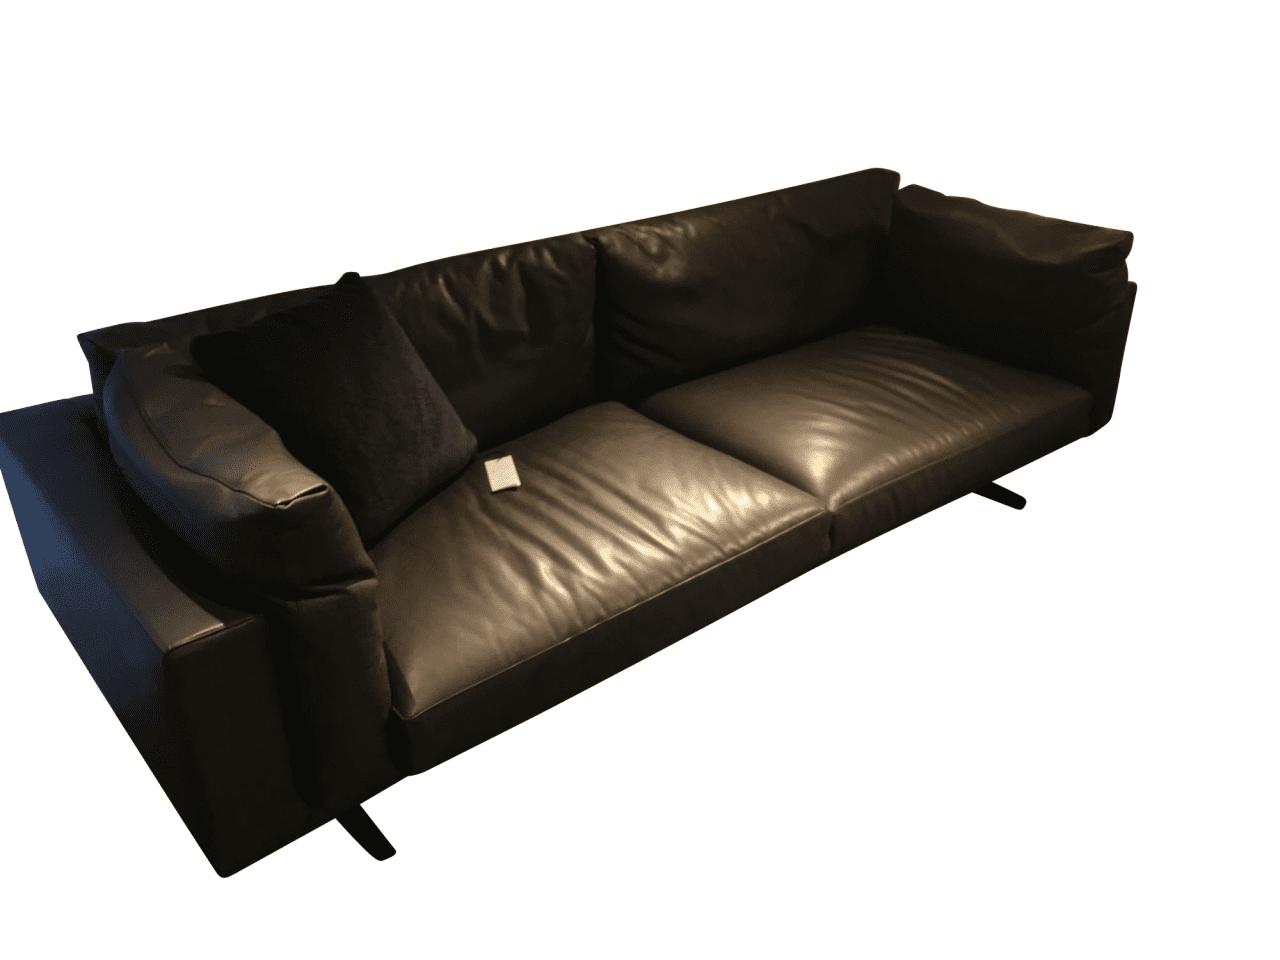 Floyd-HI Sofa